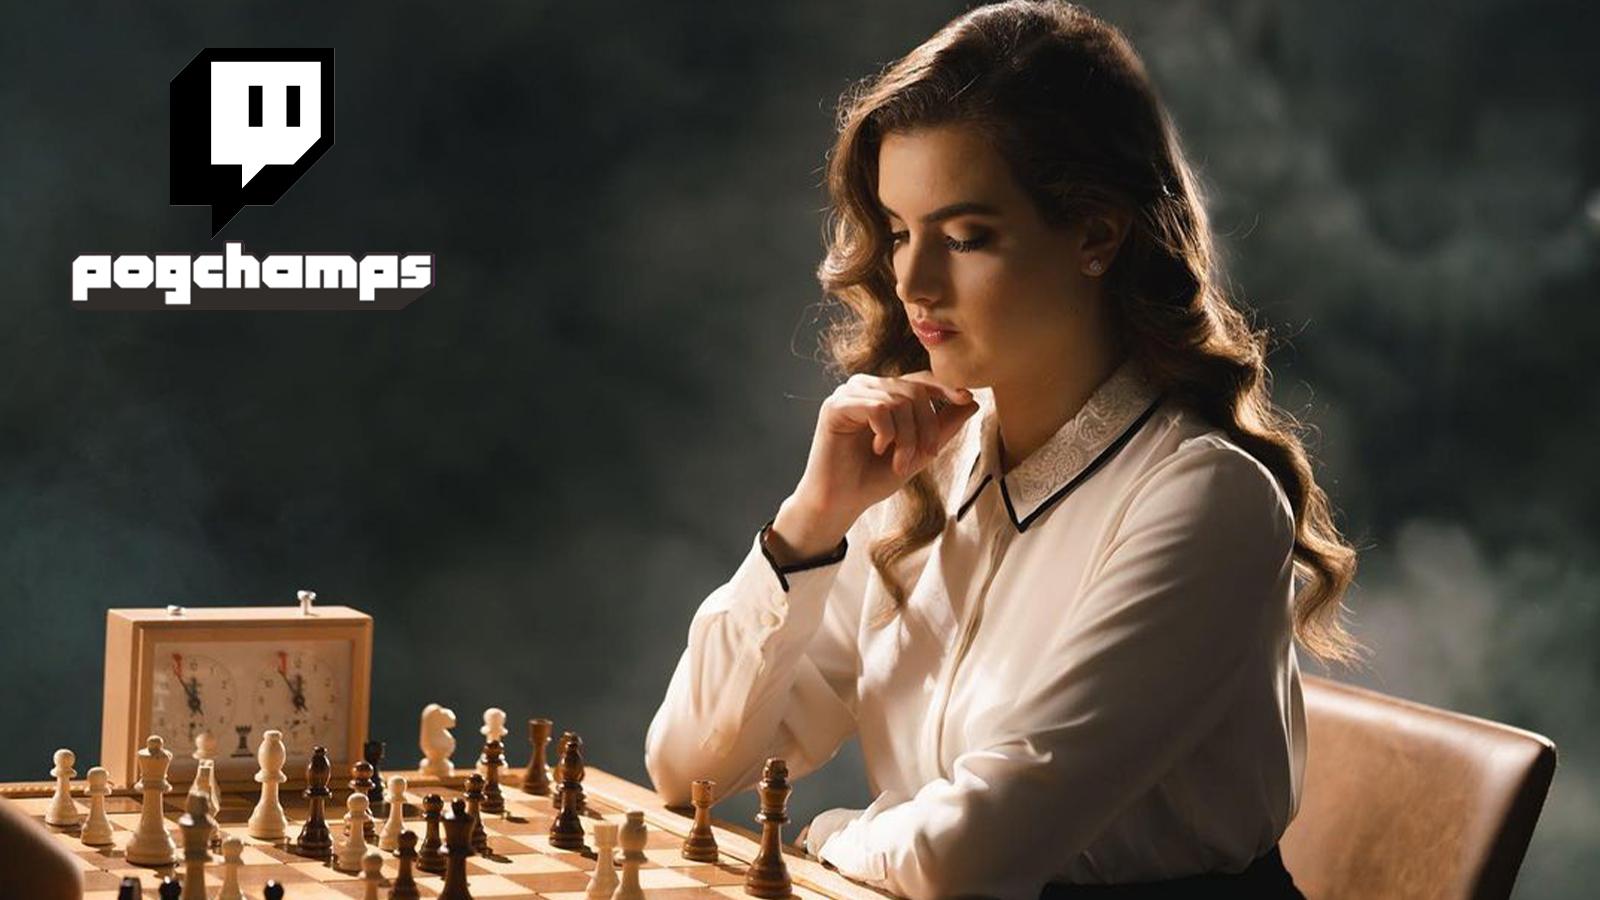 Alexandra Botez Pogchamps Twitch Chess Grandmaster